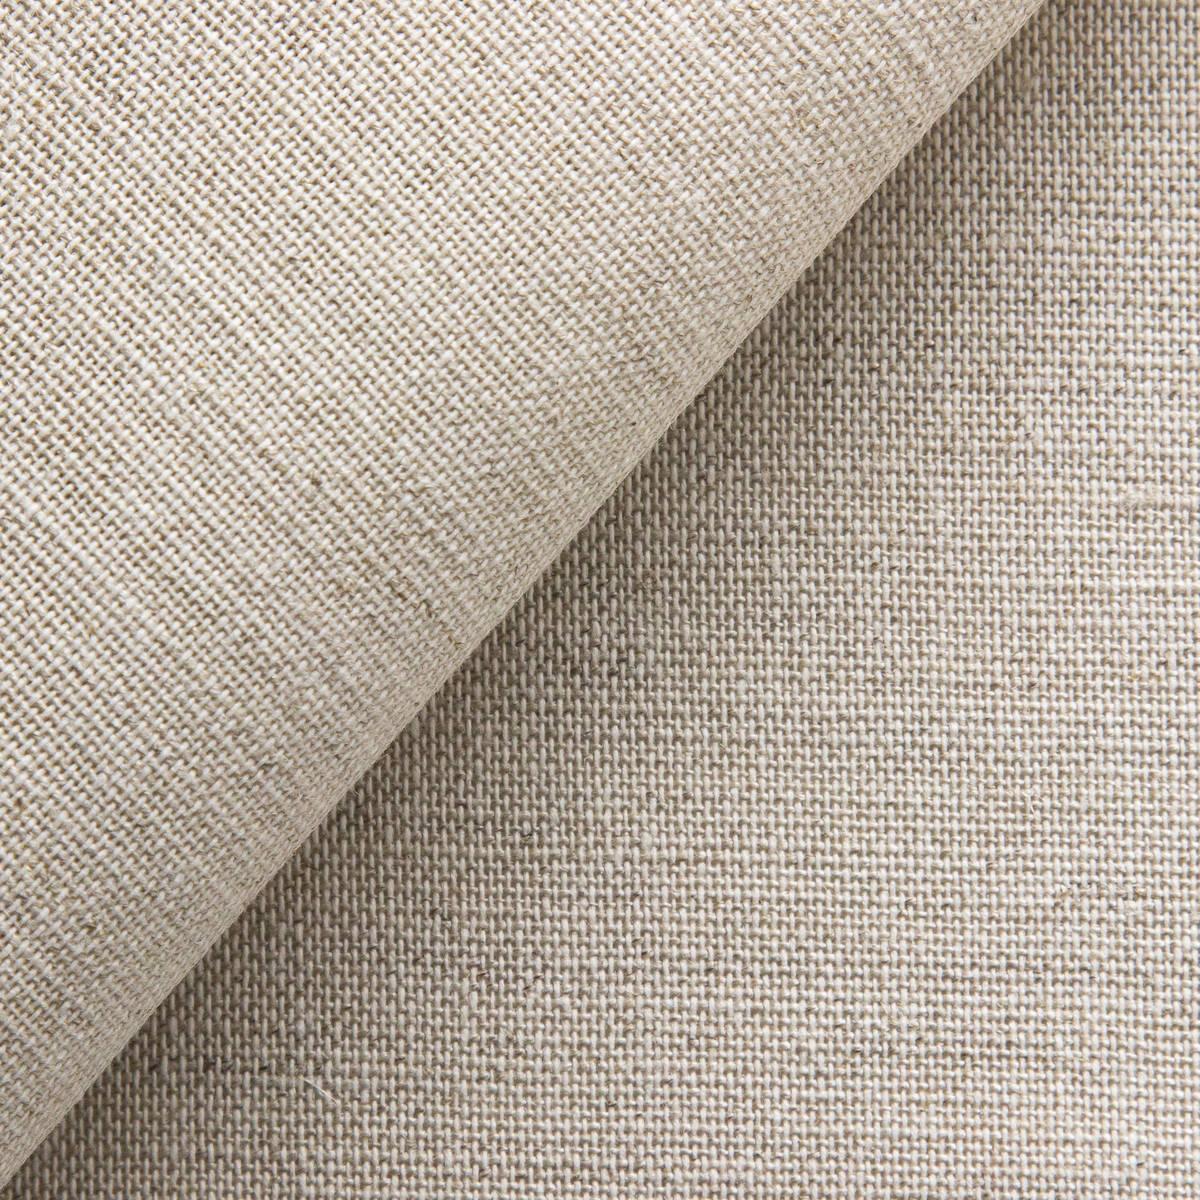 British Natural Linen 250gsm